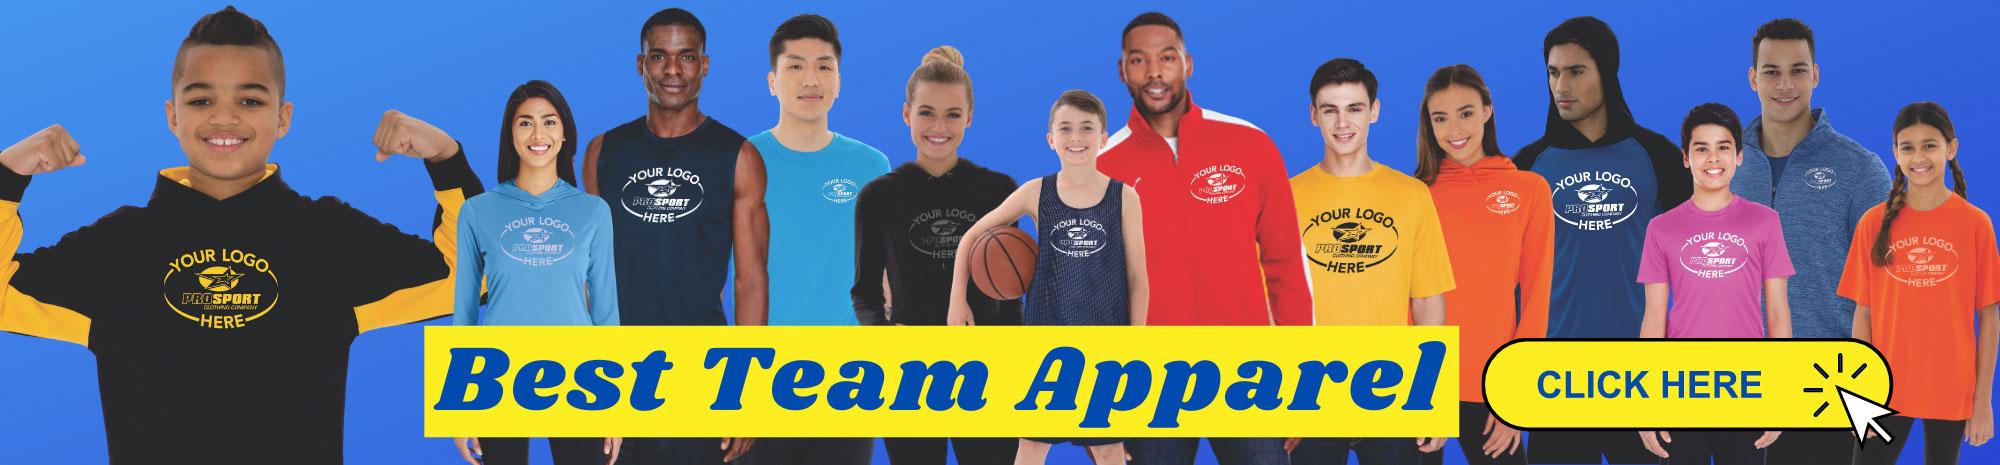 ProSport - Best Team Apparel